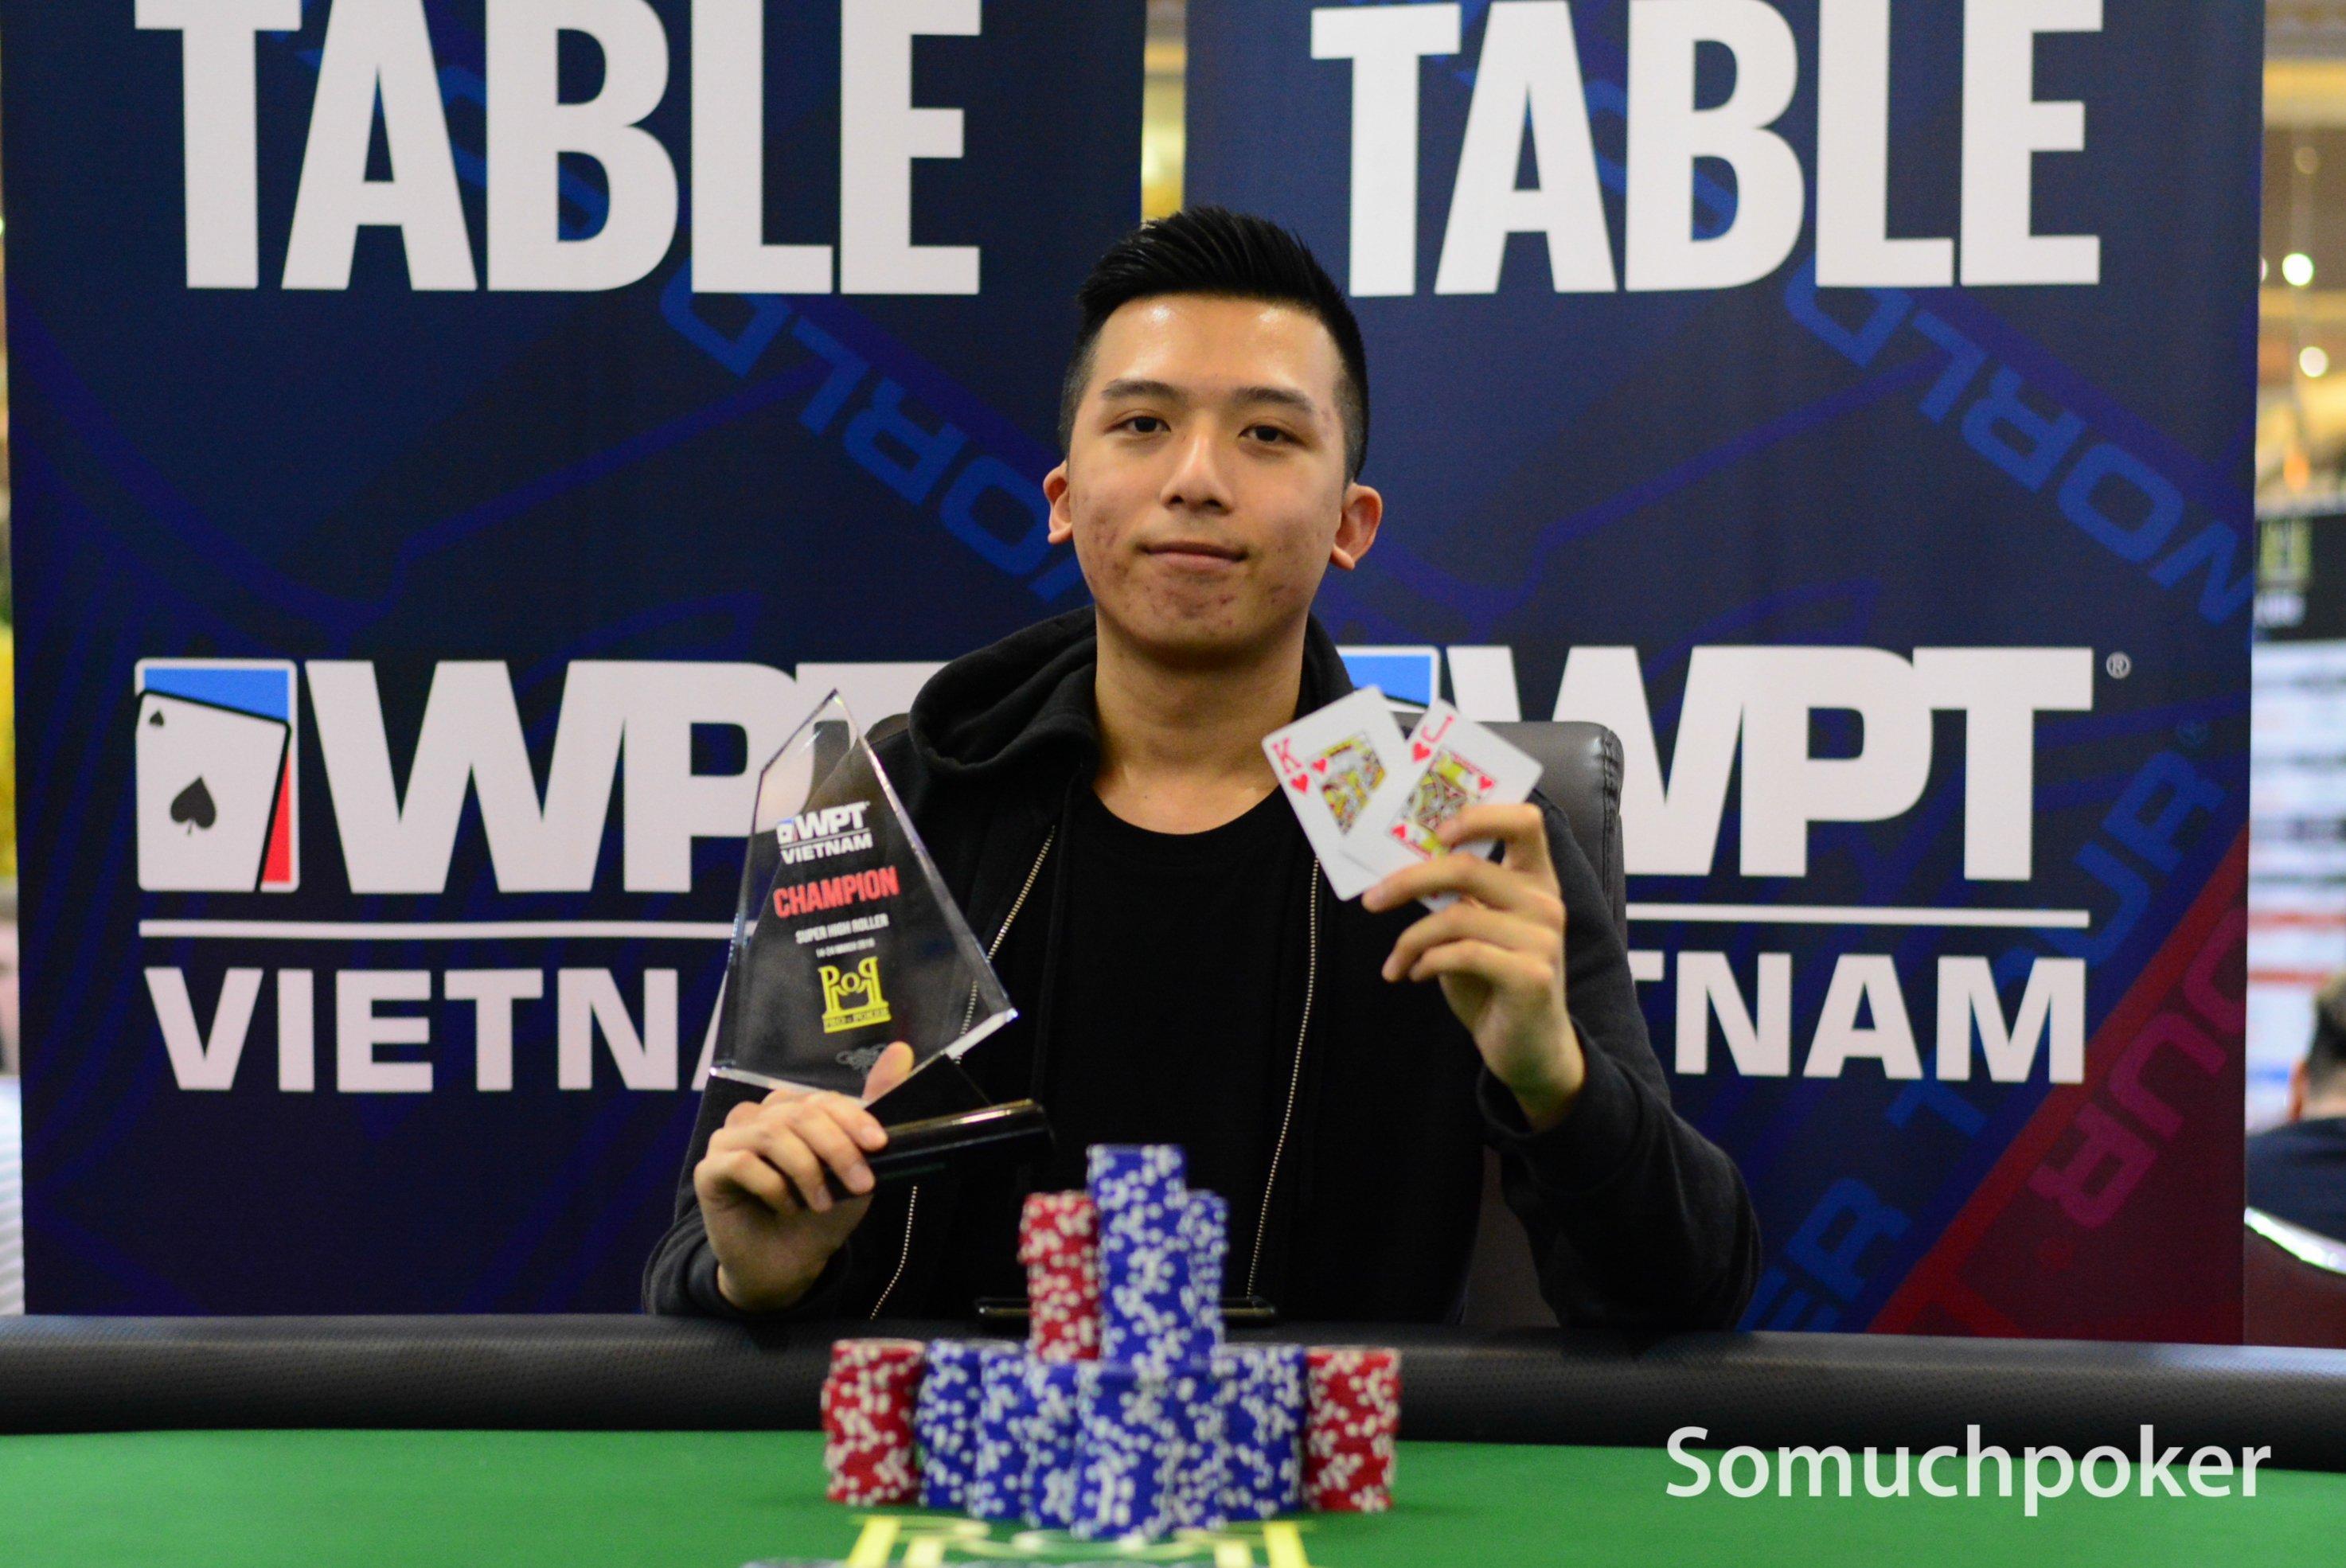 WPT Vietnam: Wayne Heung ships the Super High Roller; Macaron Tran, Pang Choyi, & Le Ngoc Khanh win events